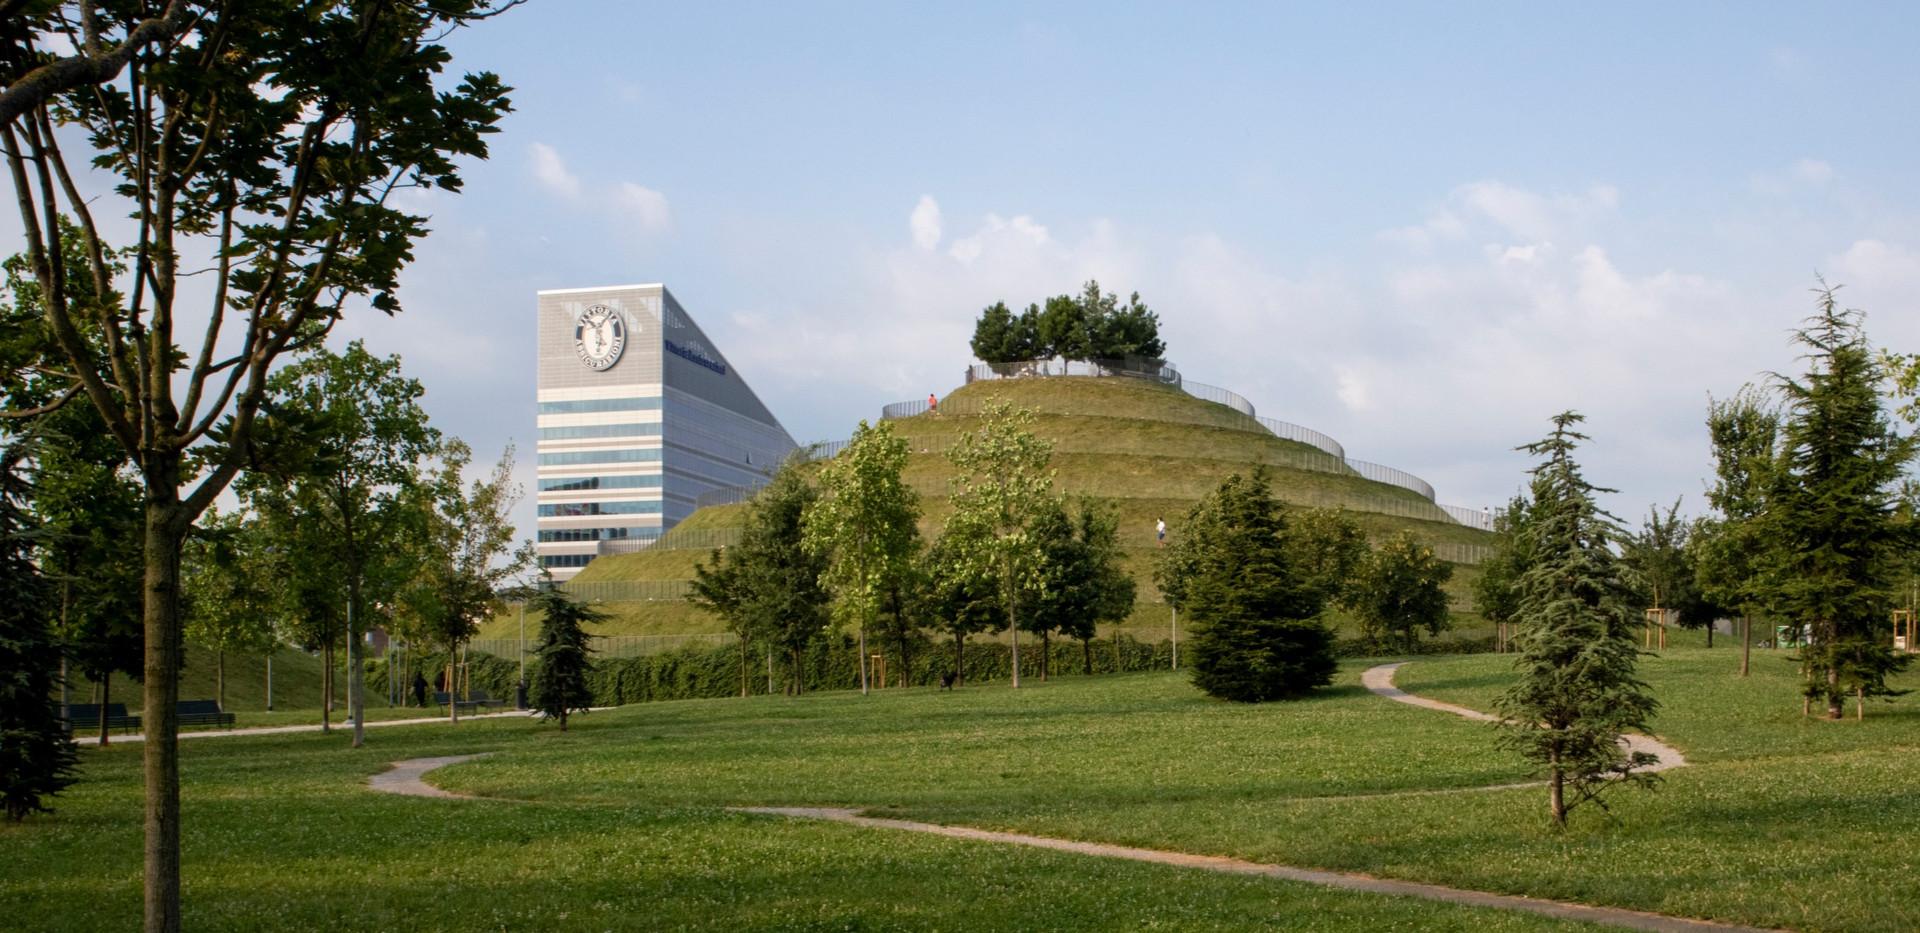 Collina DNA Parco Industria Alfa Romeo 01